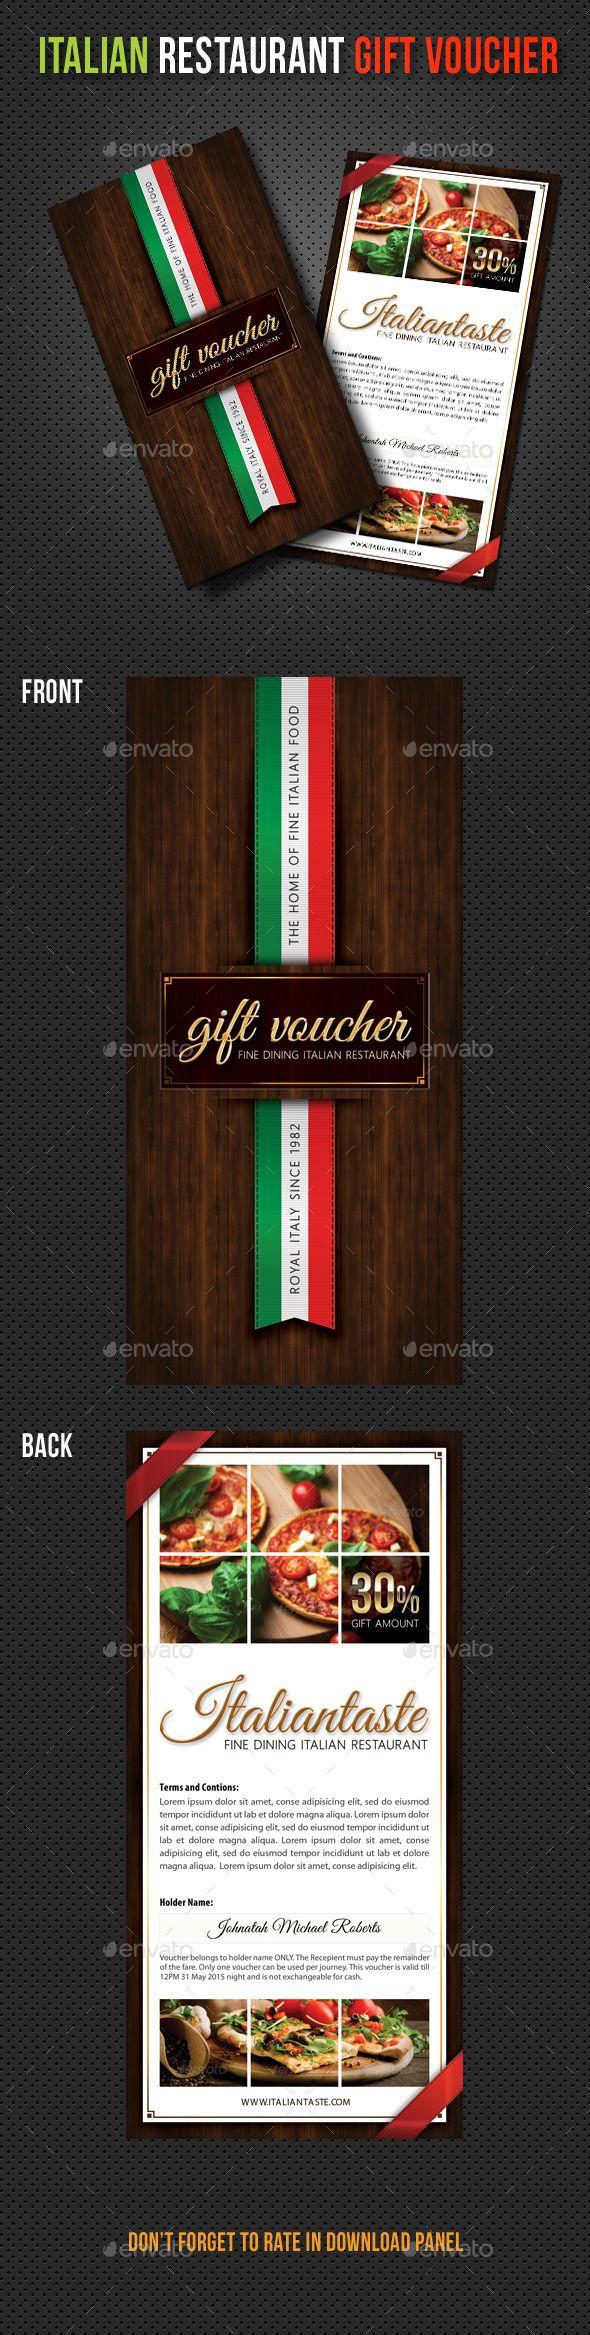 Italian Restaurant Menu Gift Voucher